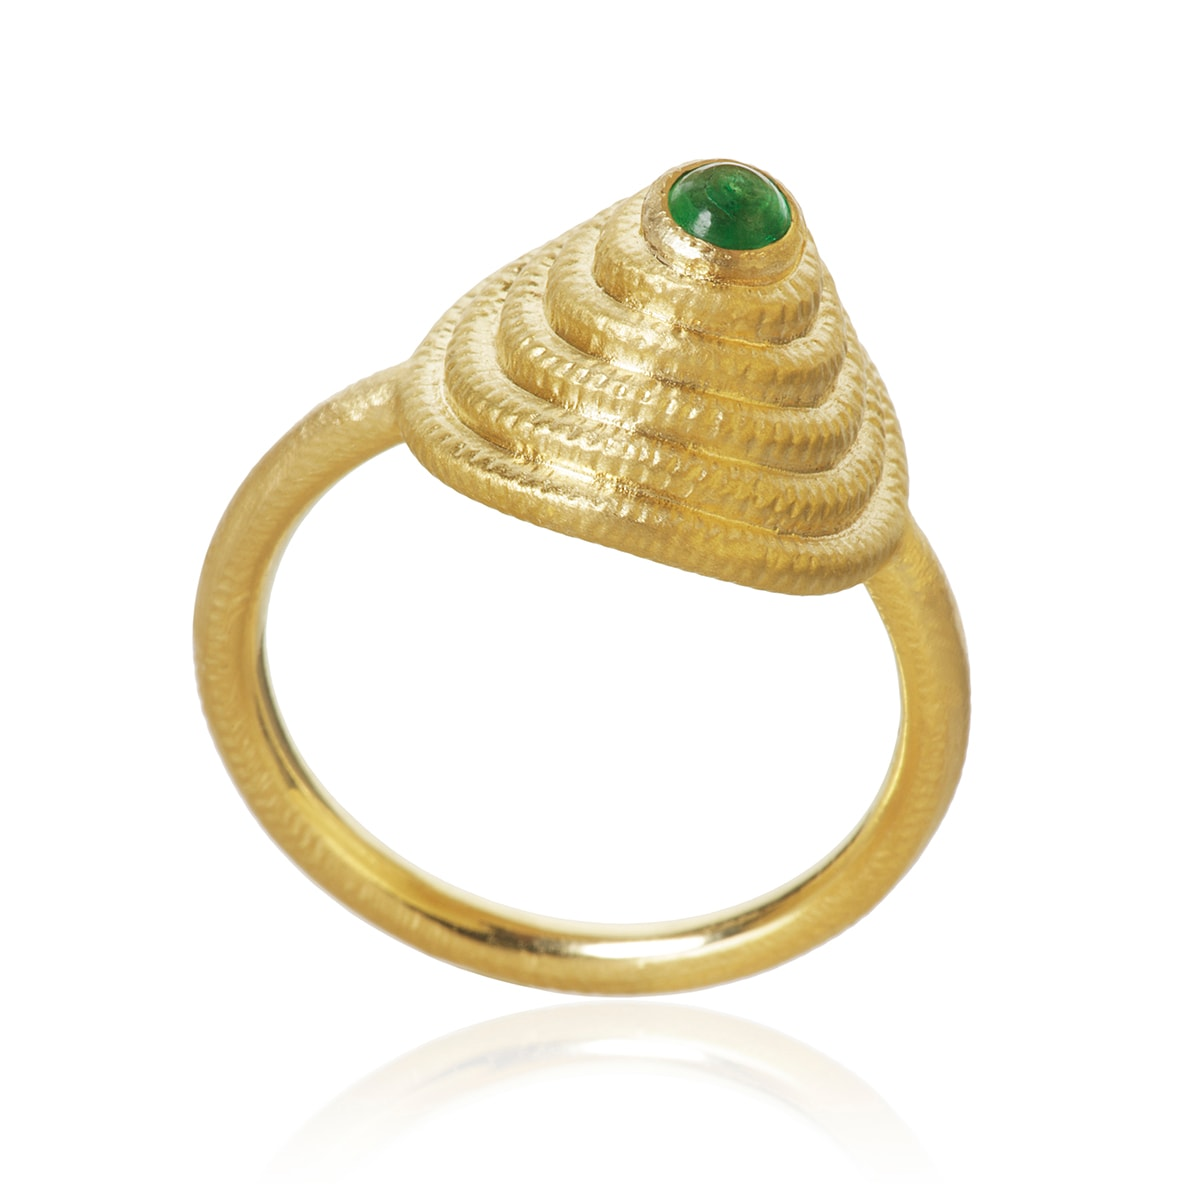 Dulong_Thera_Twist_ring_med_Smaragd_THE3-A1151_hos_Jarl_Sandin